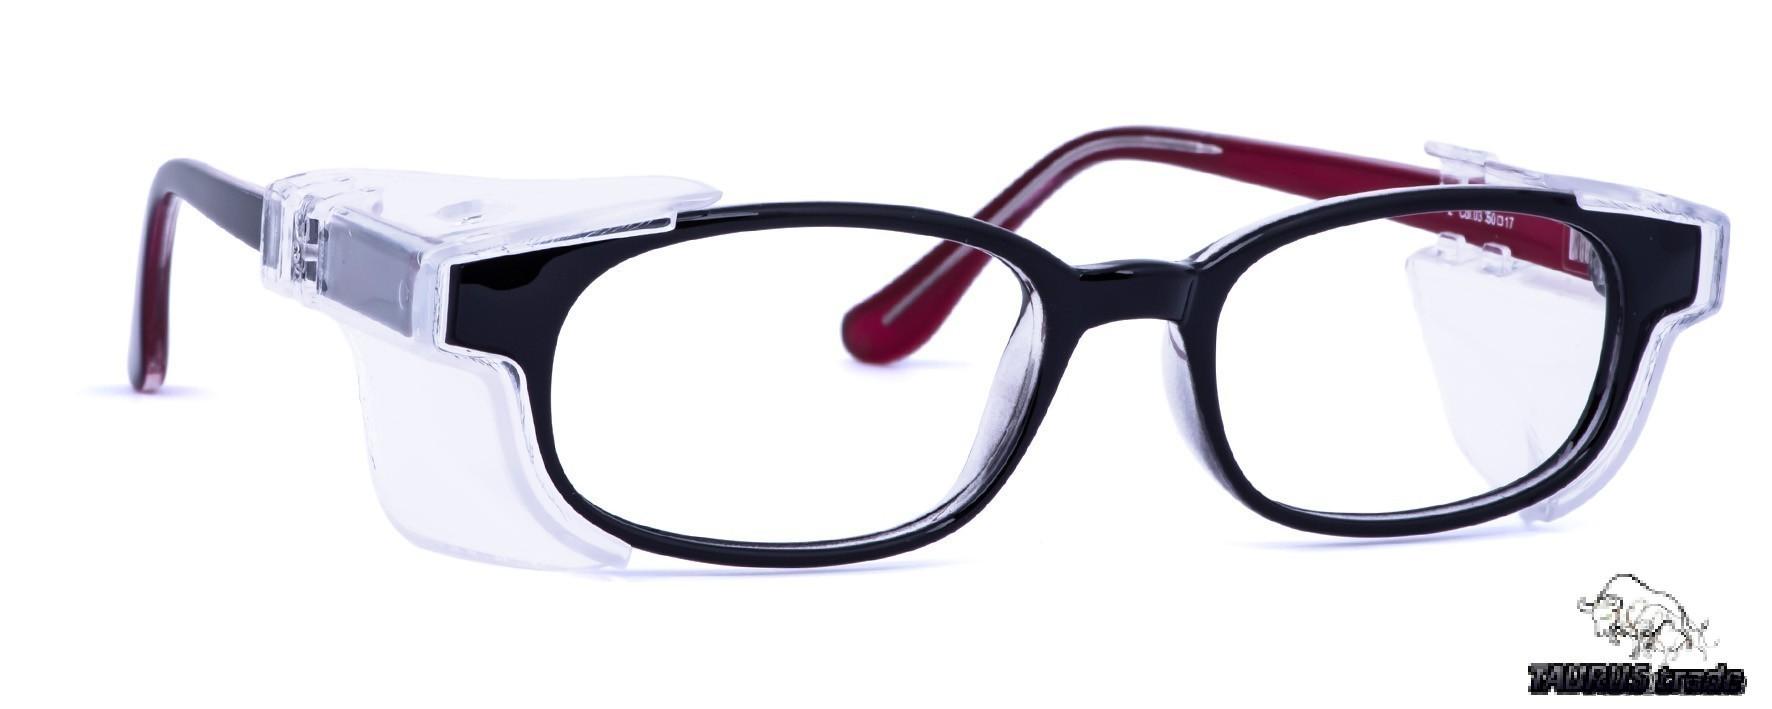 2070-03-5017-VISION-2-schwarz-rot